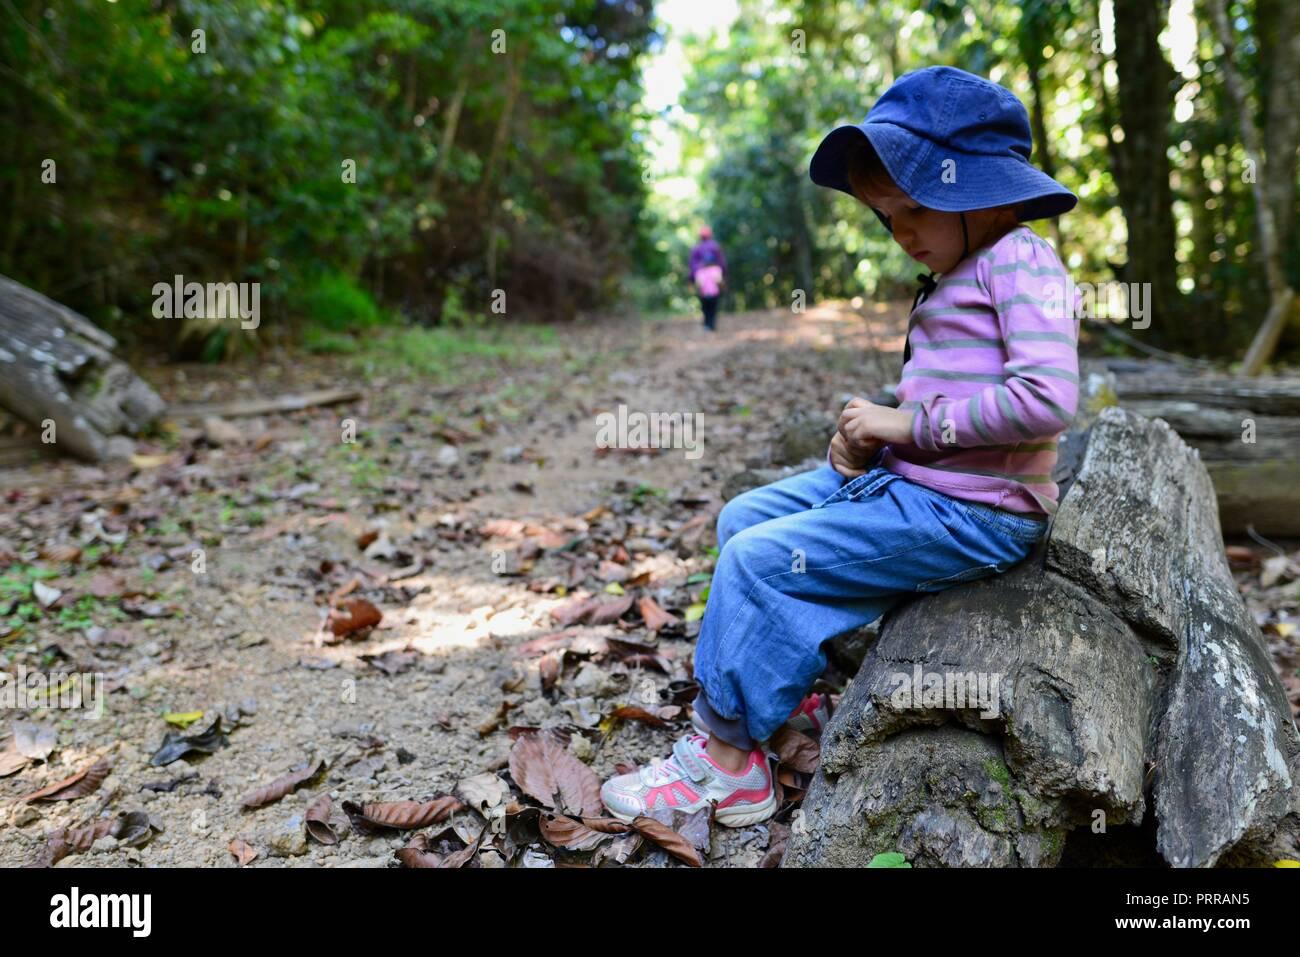 Child Hiking Log Stock Photos & Child Hiking Log Stock